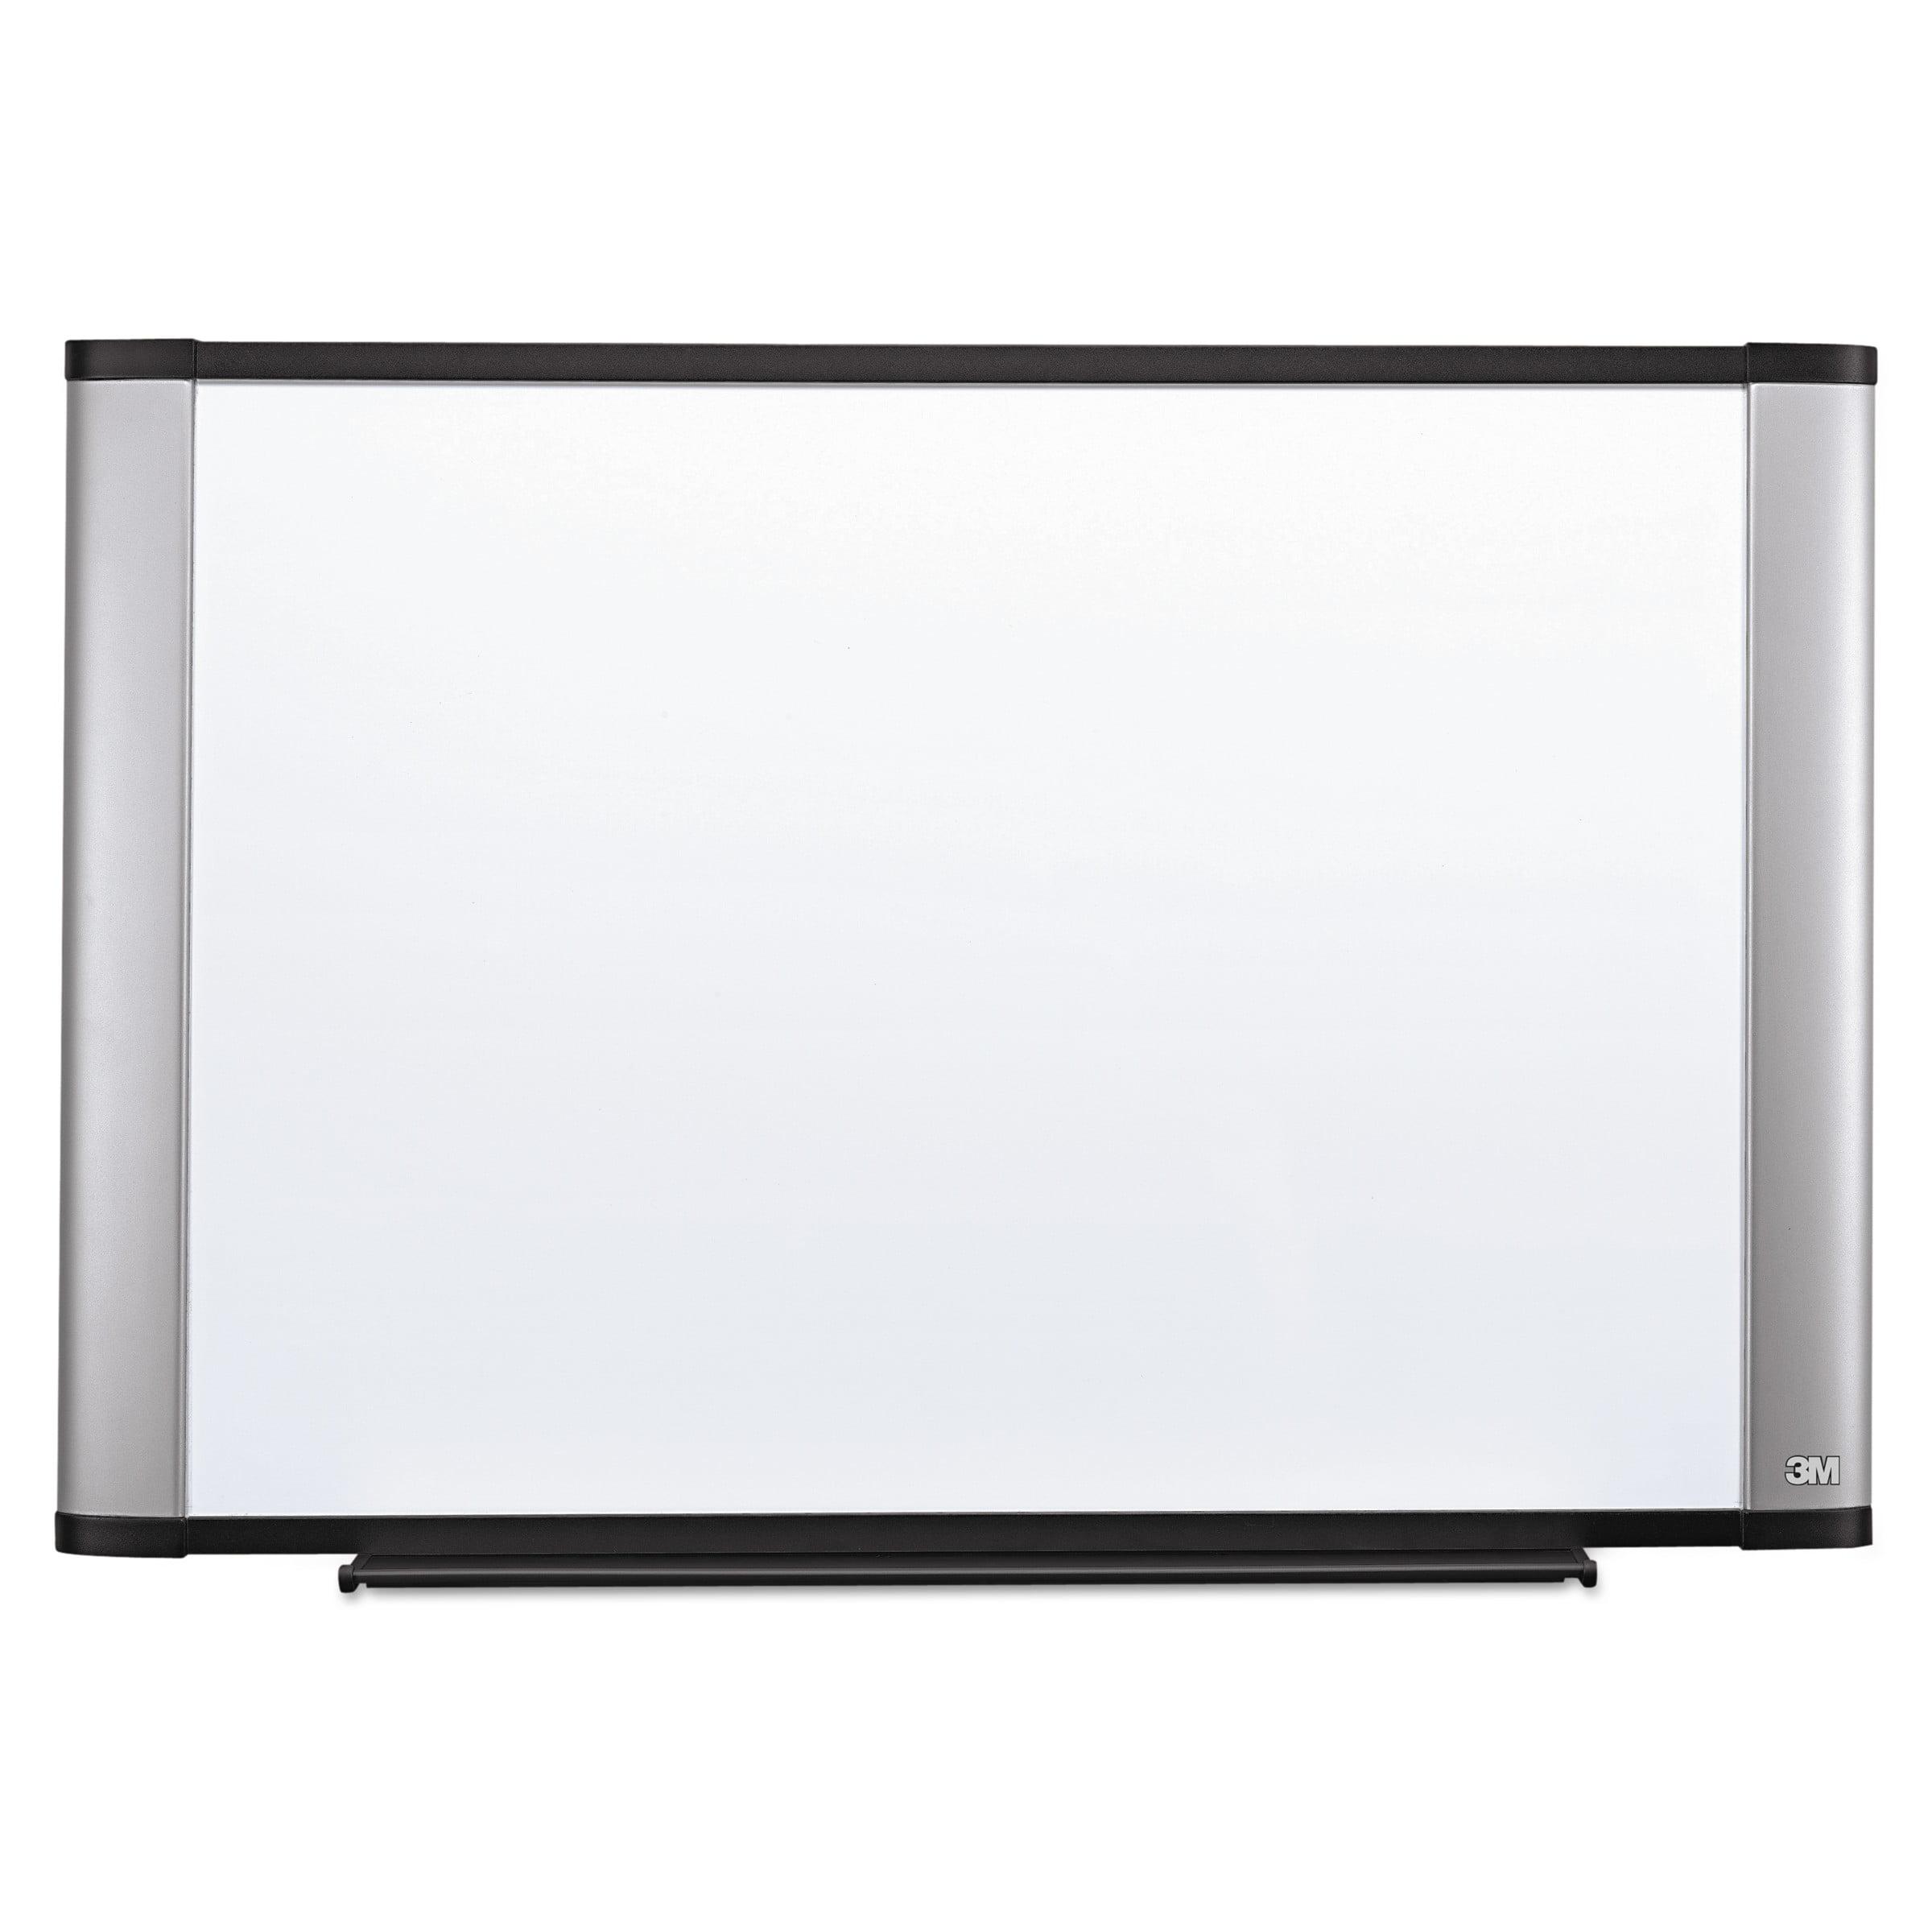 3M Melamine Dry Erase Board, 48 x 36, Aluminum Frame by 3M/COMMERCIAL TAPE DIV.